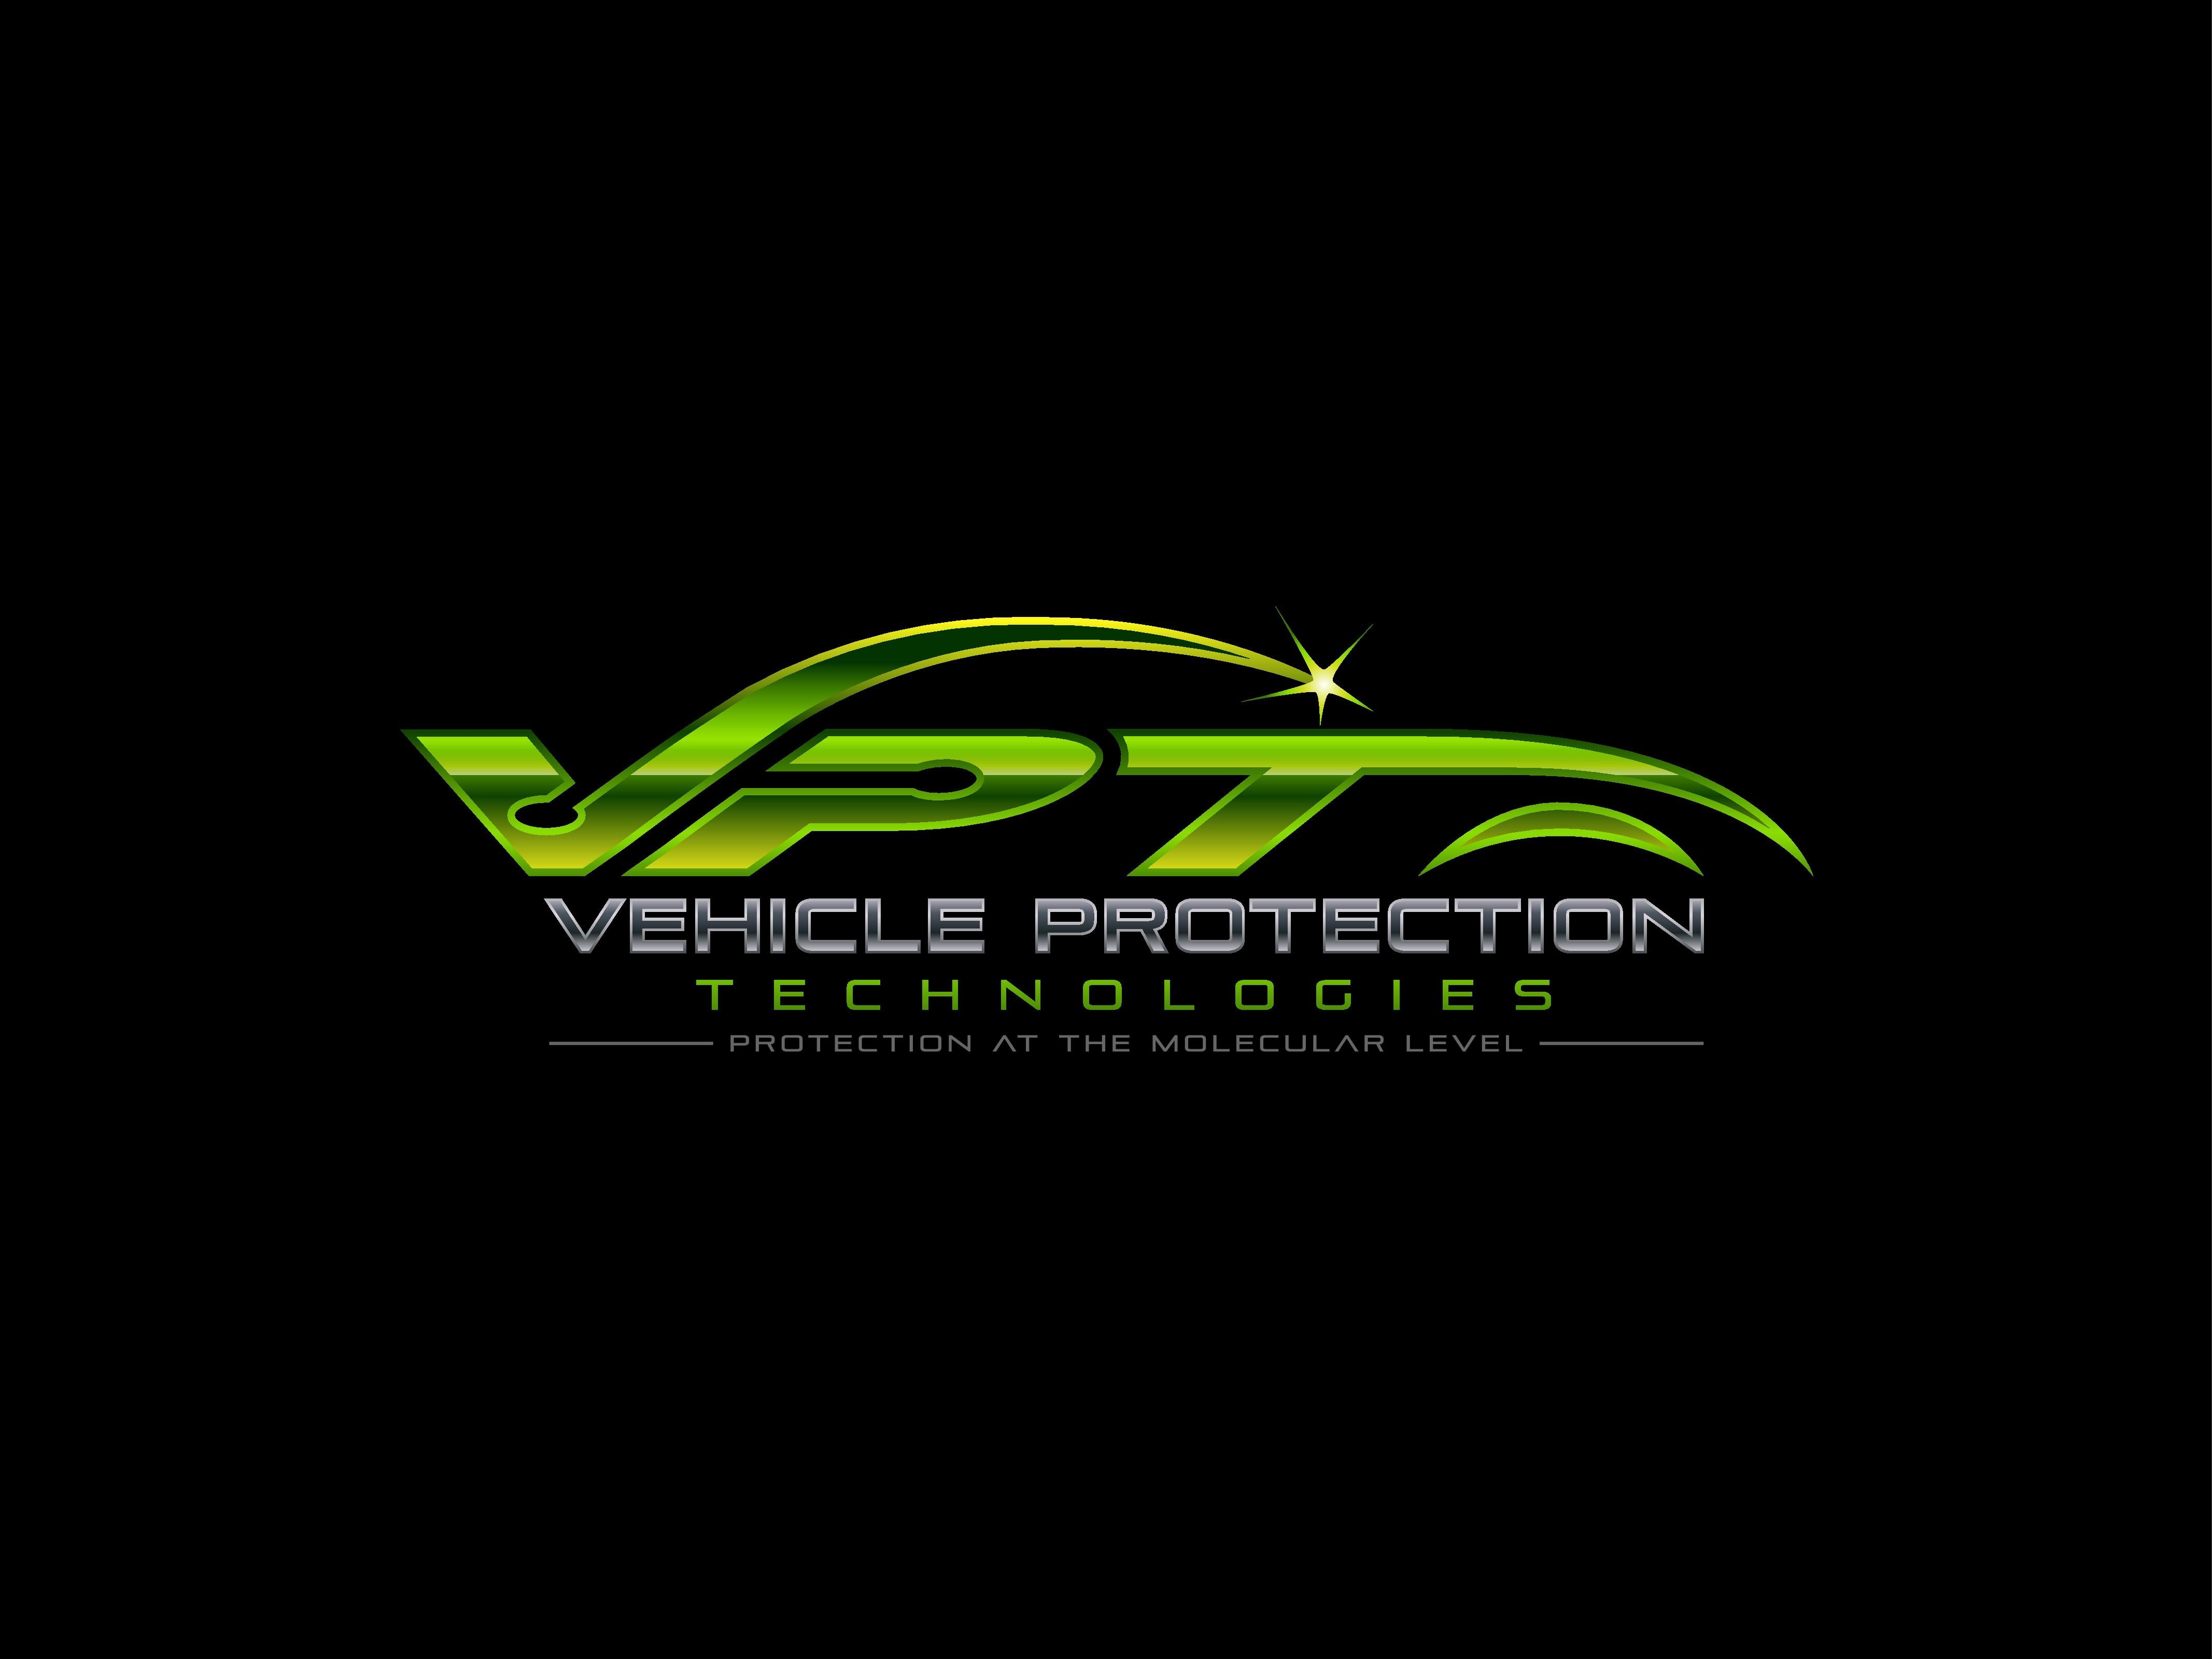 Vehicle Protection Technologies Logo